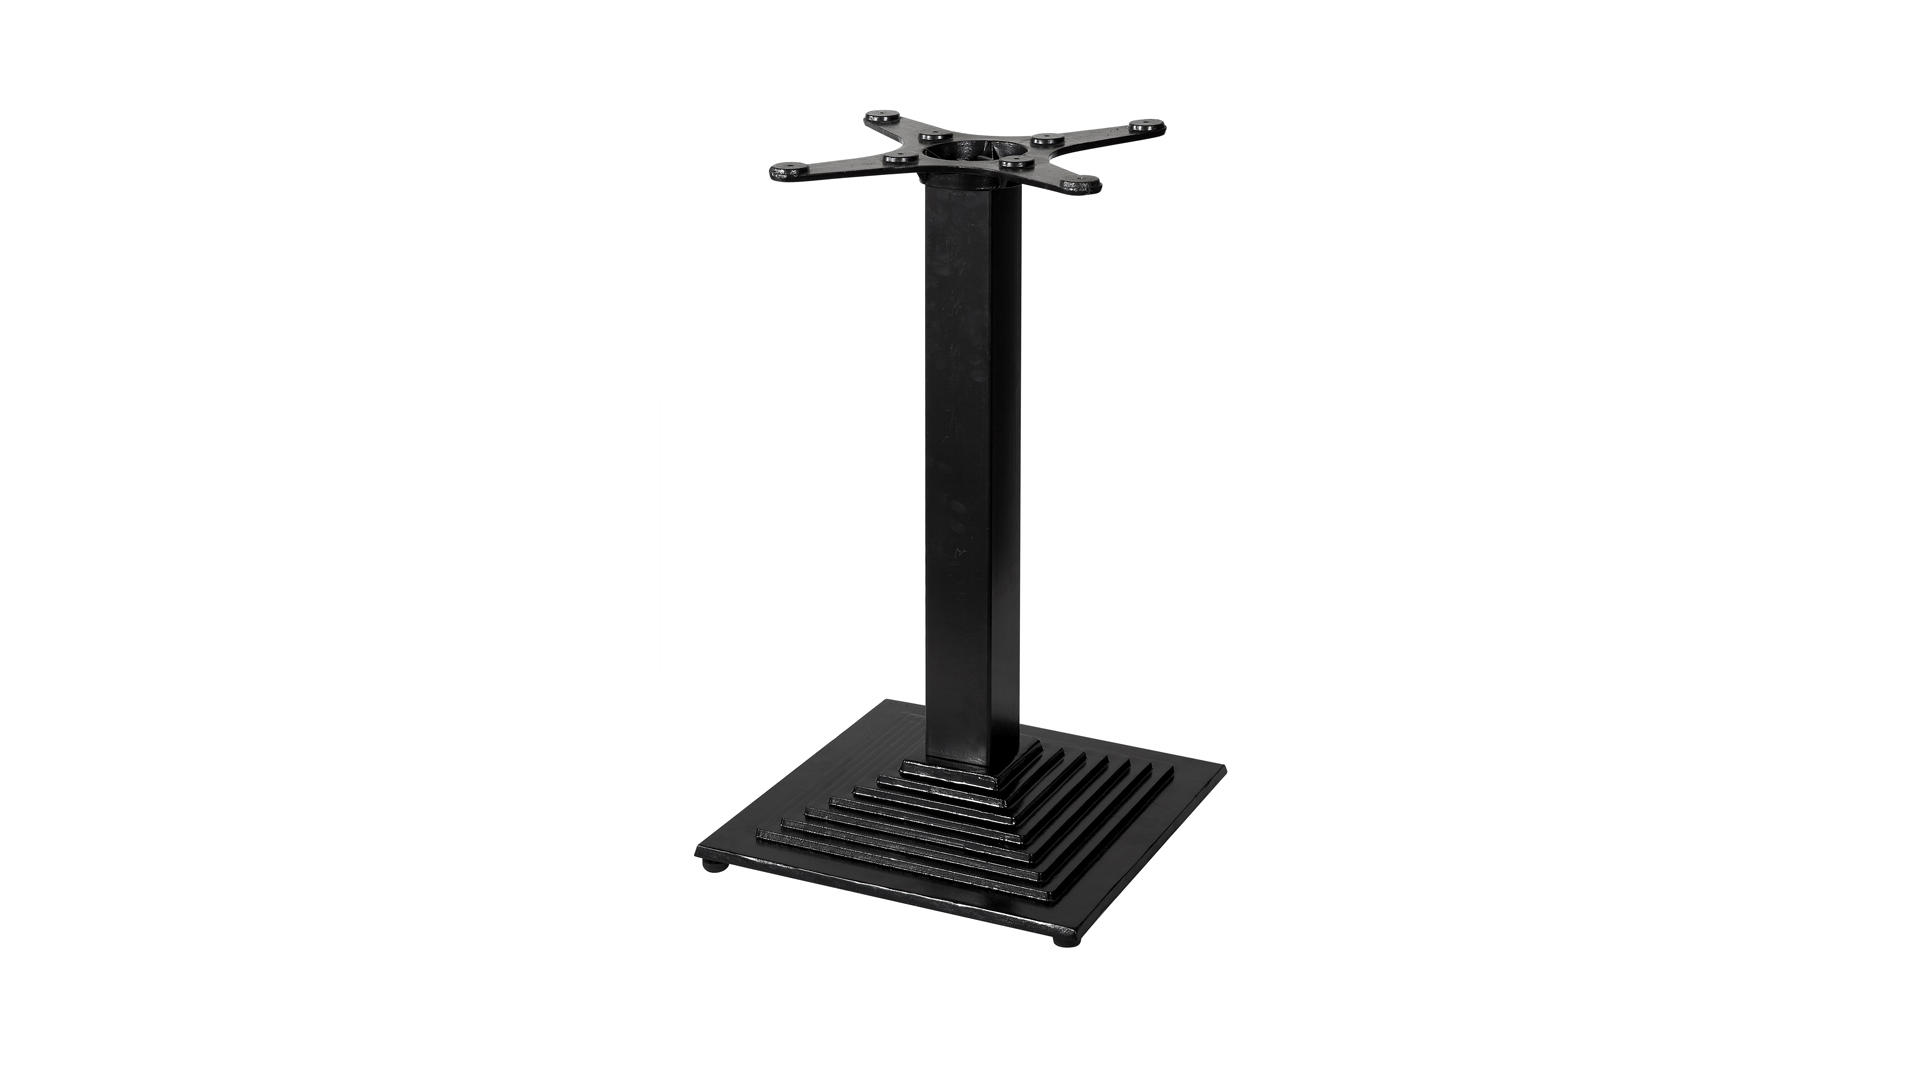 Pata de mesa de diseño francés estándar de estilo industrial negro mate TBIR-06